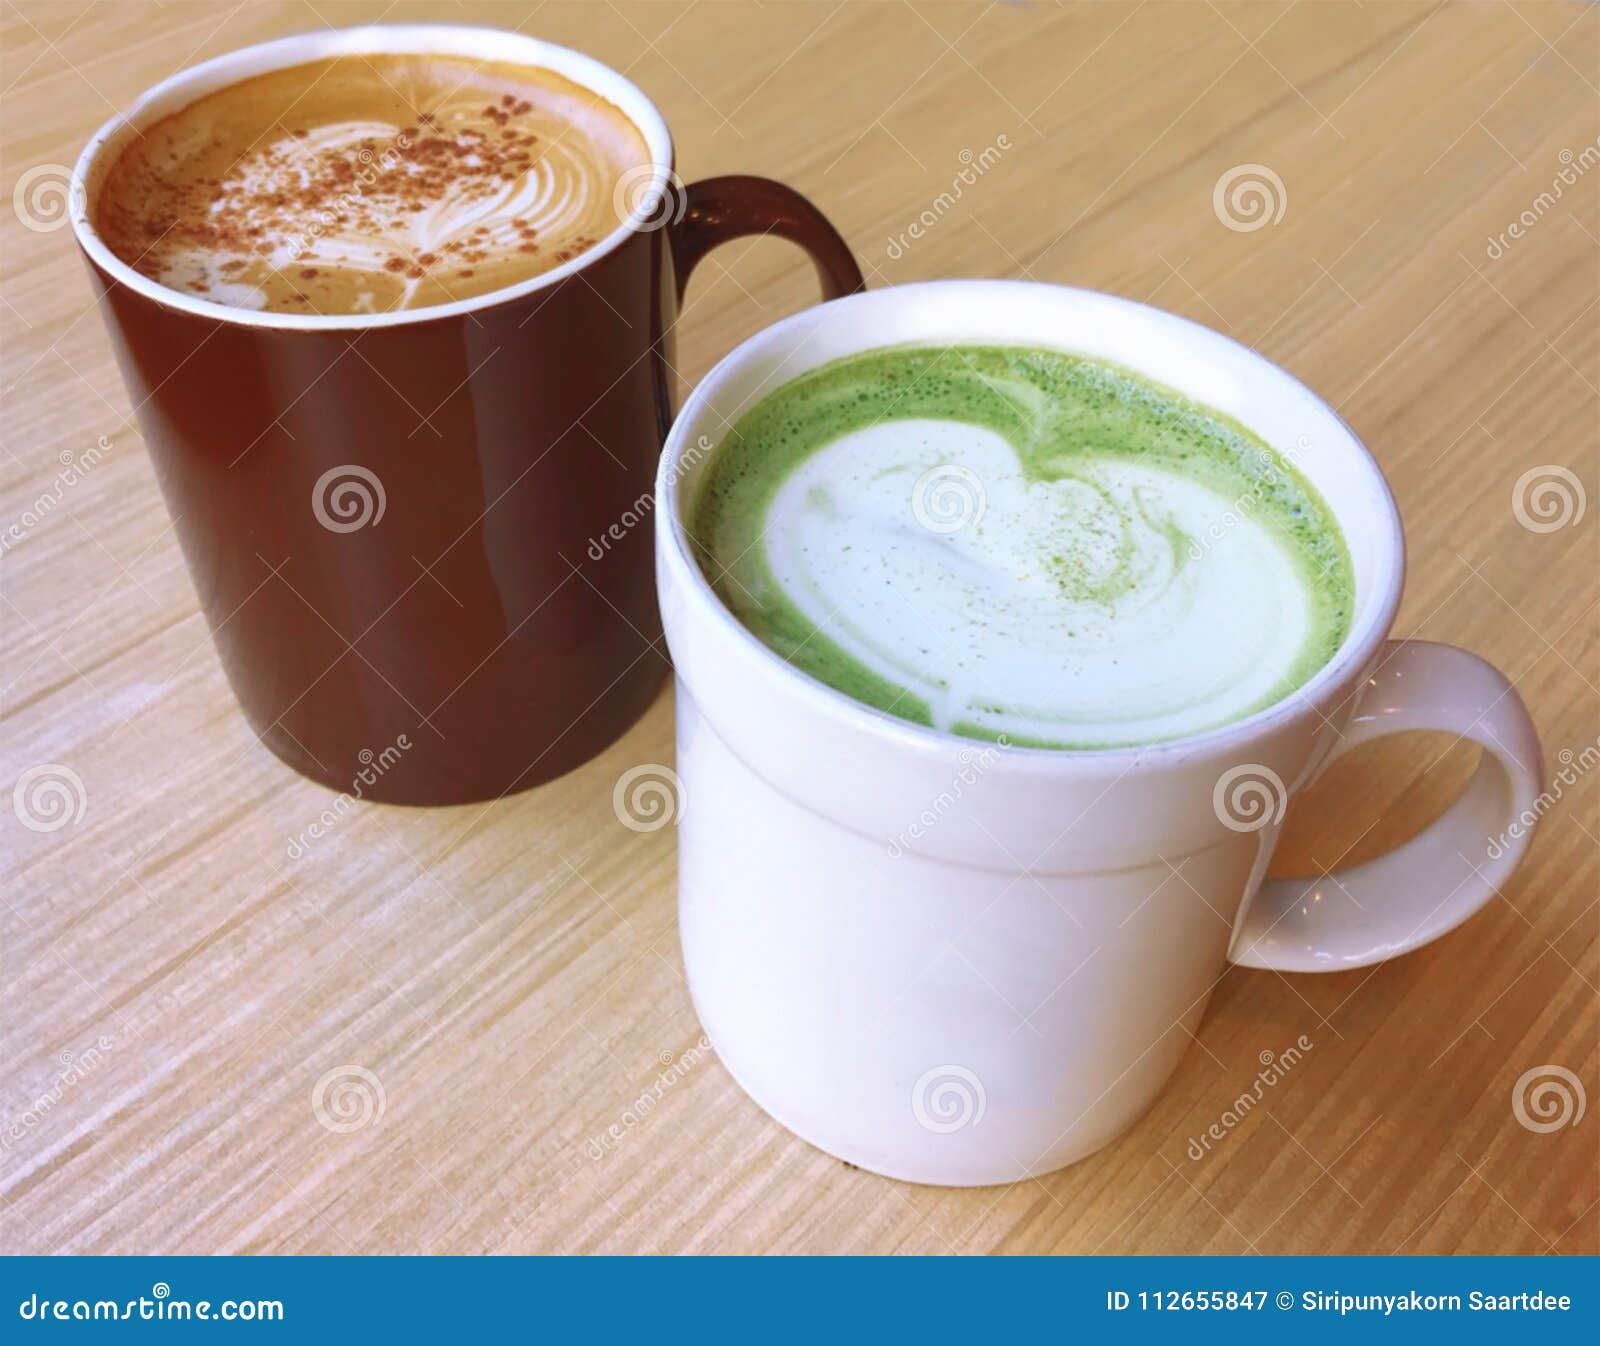 Matcha Latte,Green Tea Latte,Creamy Coffee , Cappuccino